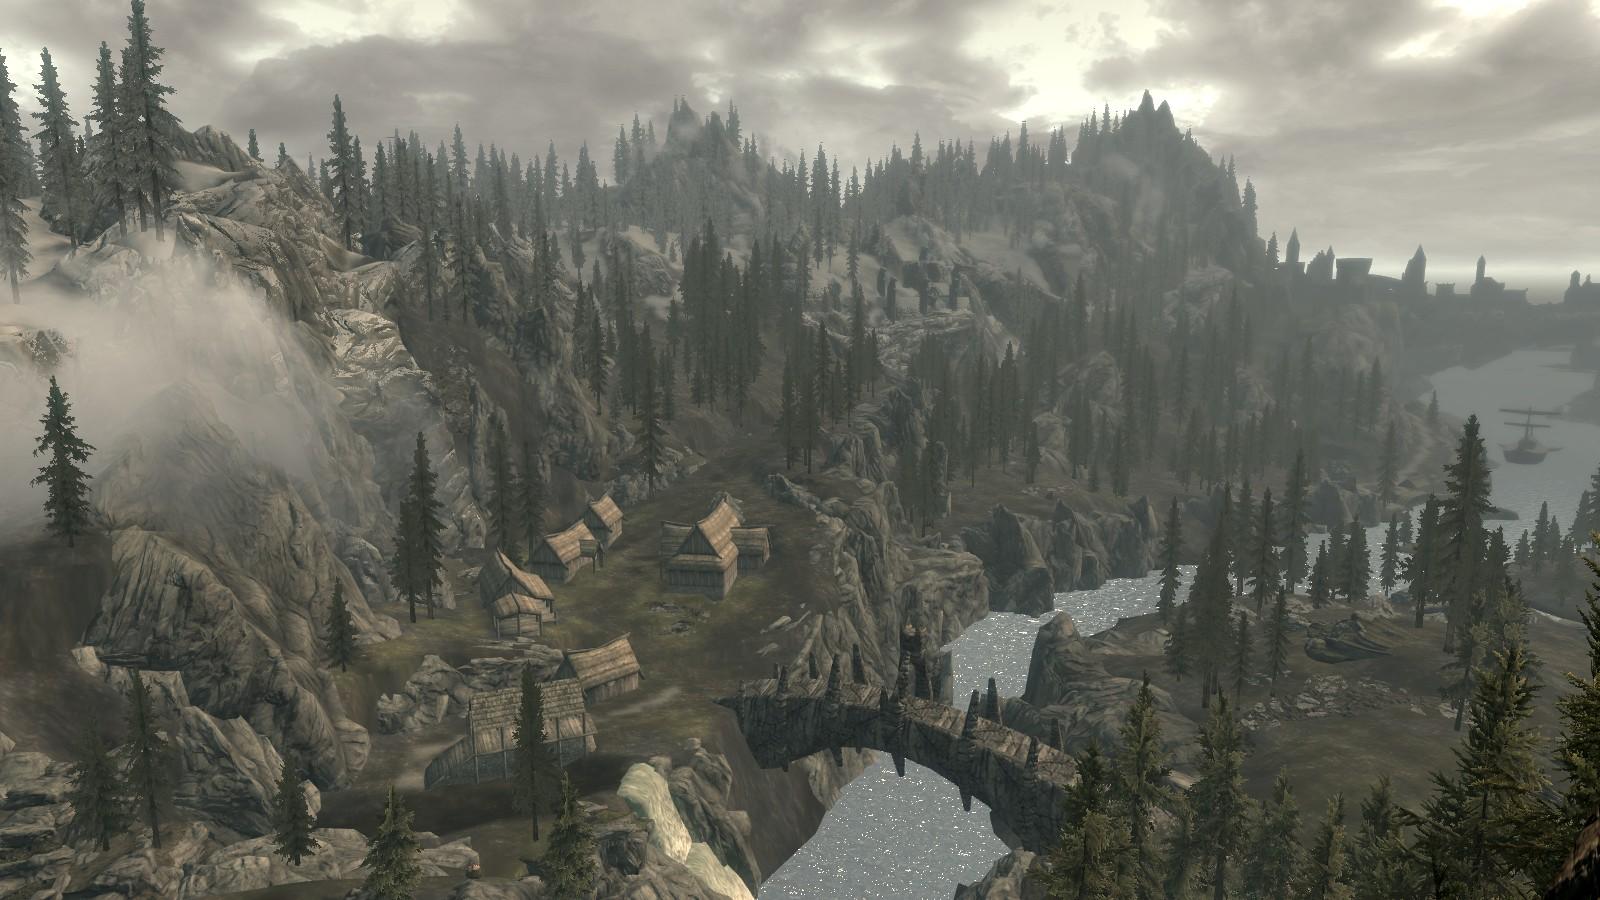 Dragon Bridge Overlook Wallpaper and Background Image 1600x900 1600x900